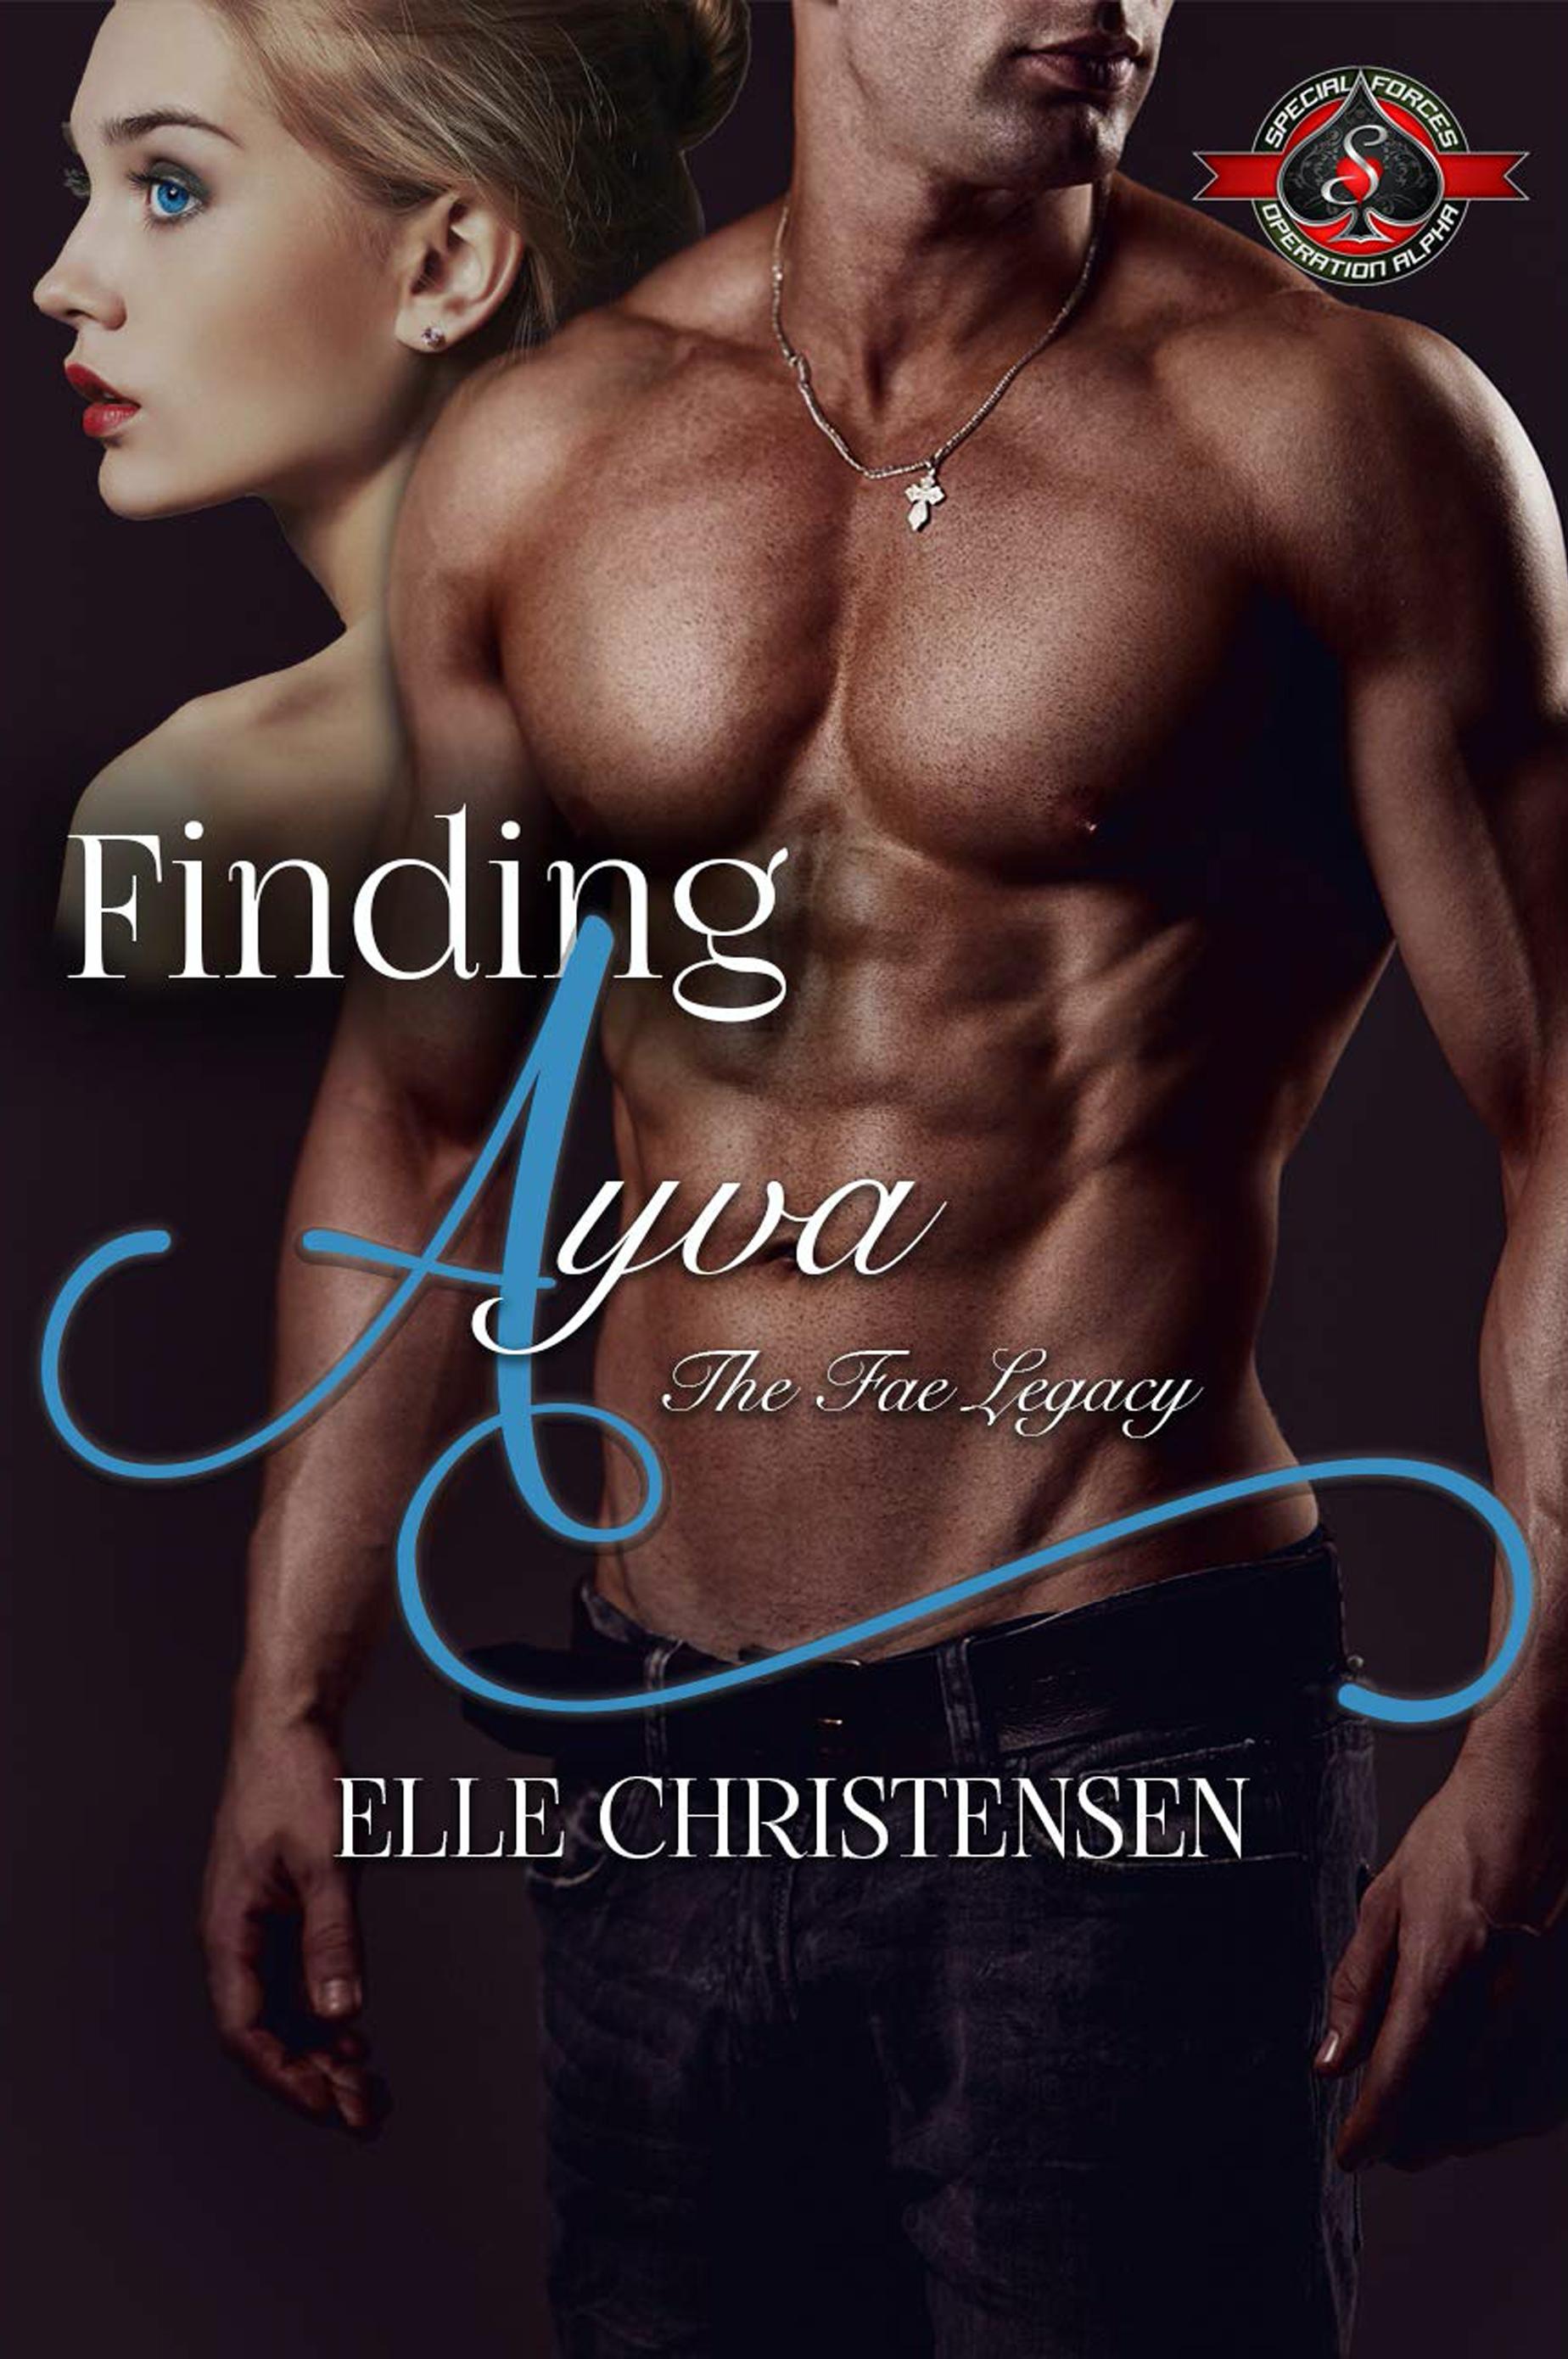 Finding Ayva